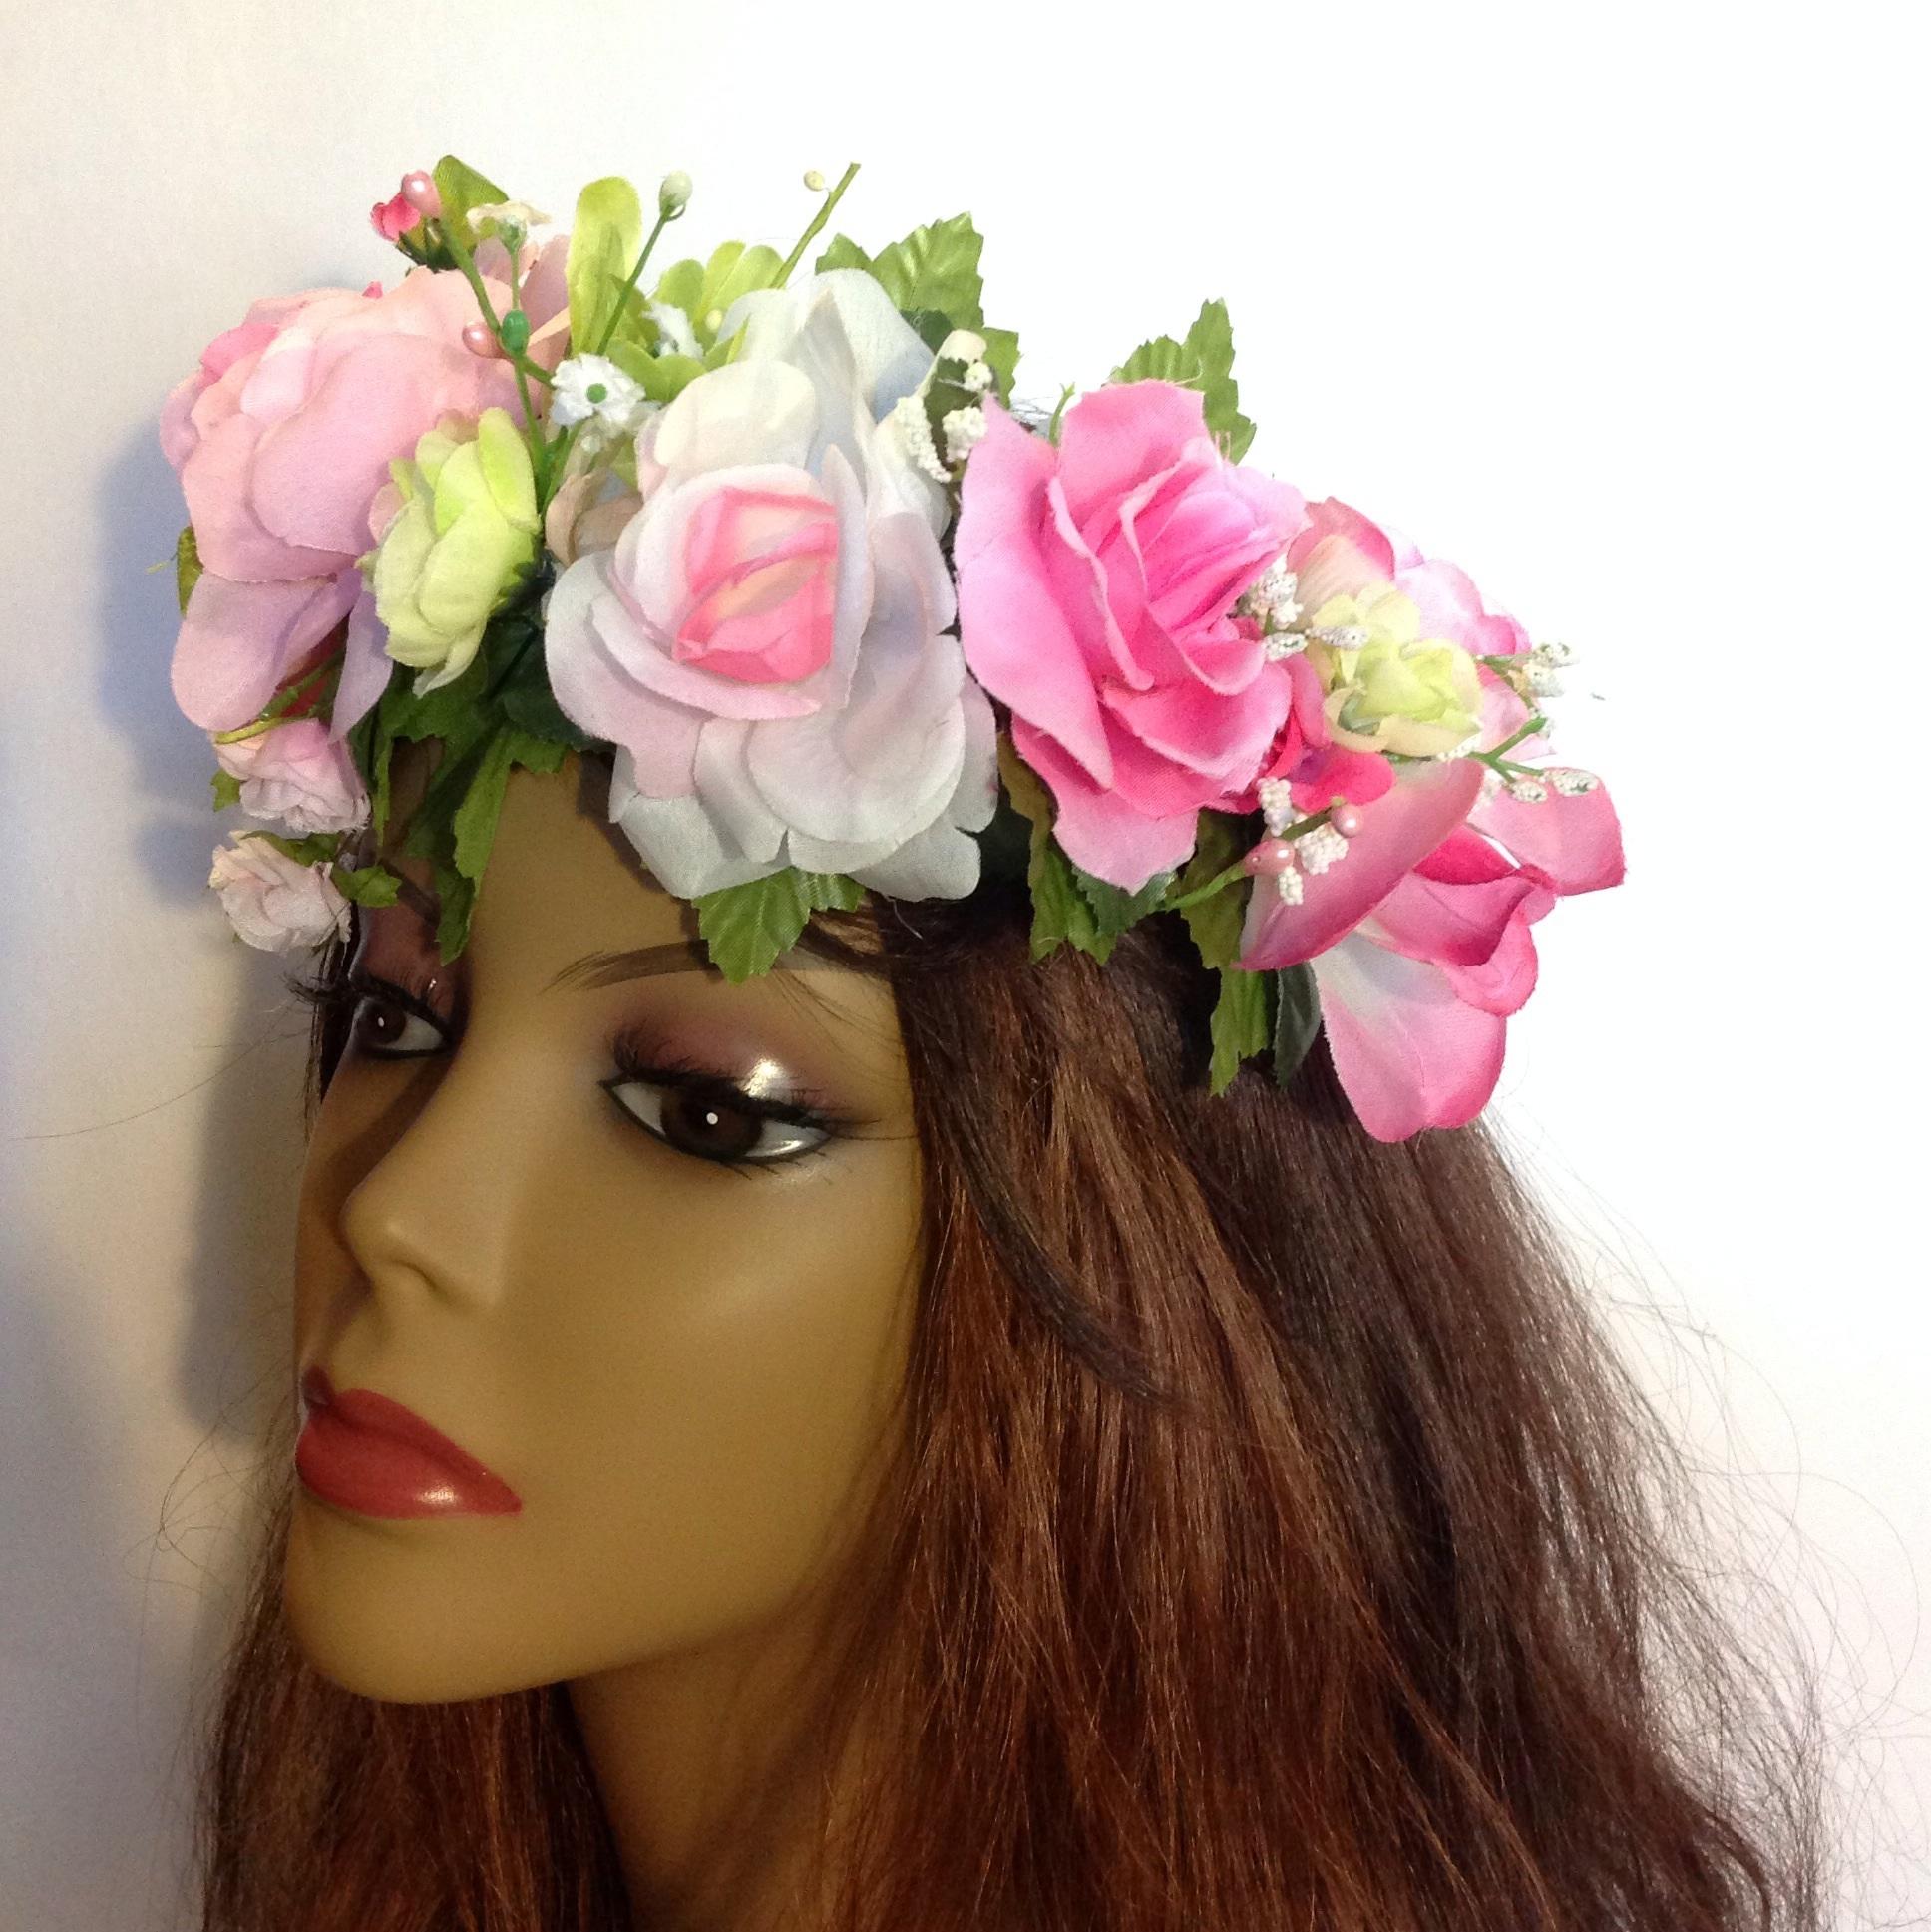 Rose flower crown rave crown festival crown bridal crown floral image original izmirmasajfo